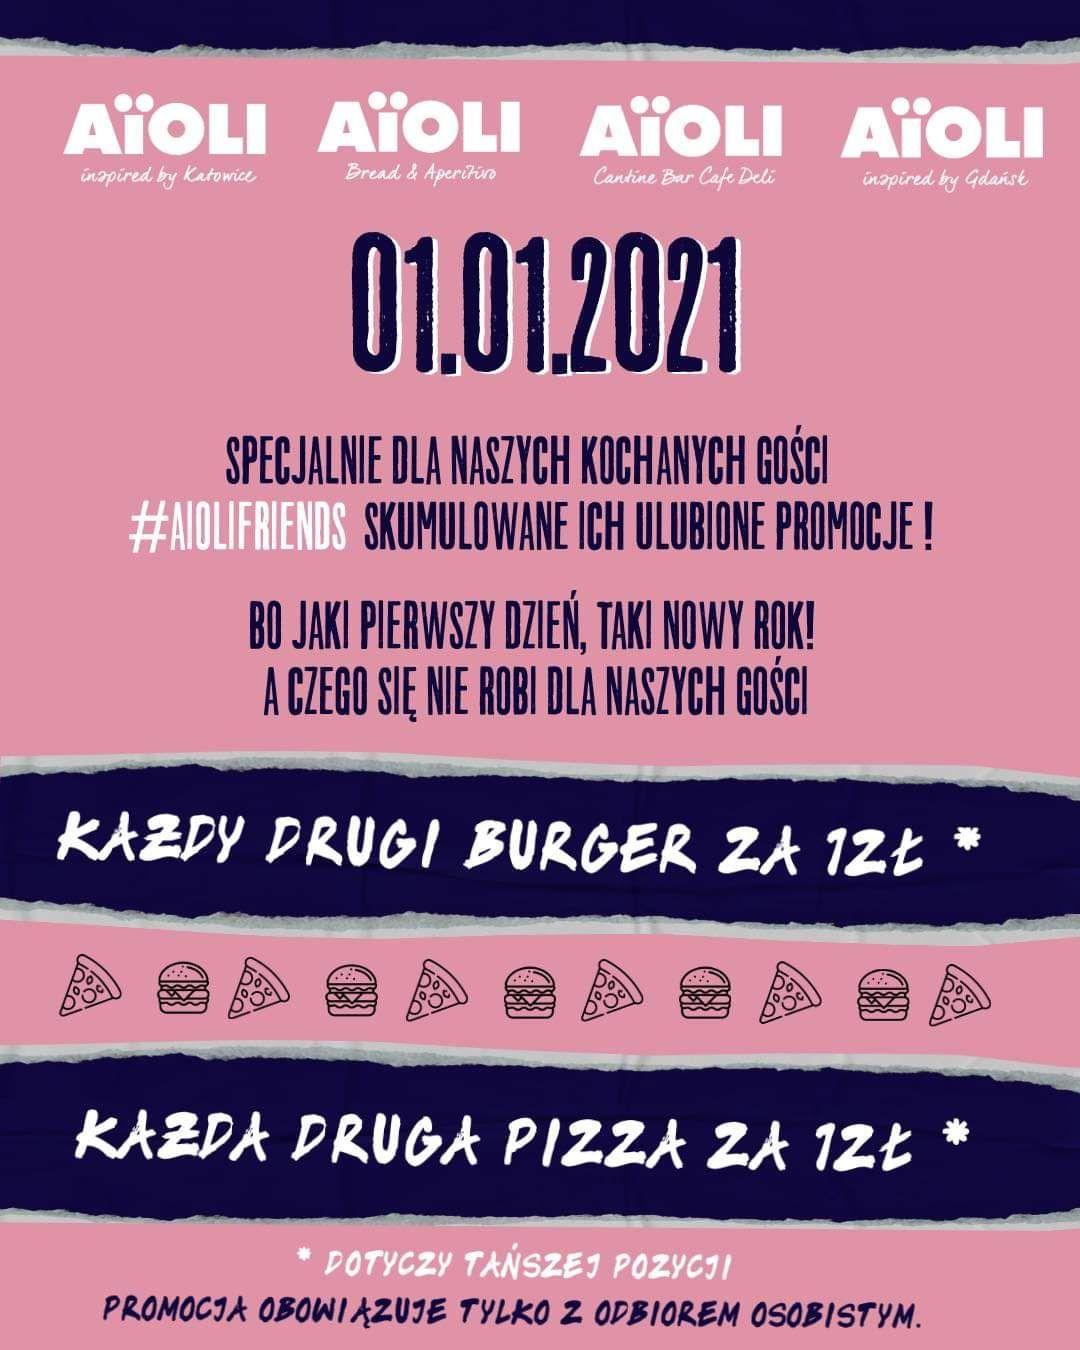 Aiöli - Druga pizza lub drugi burger za 1 zł